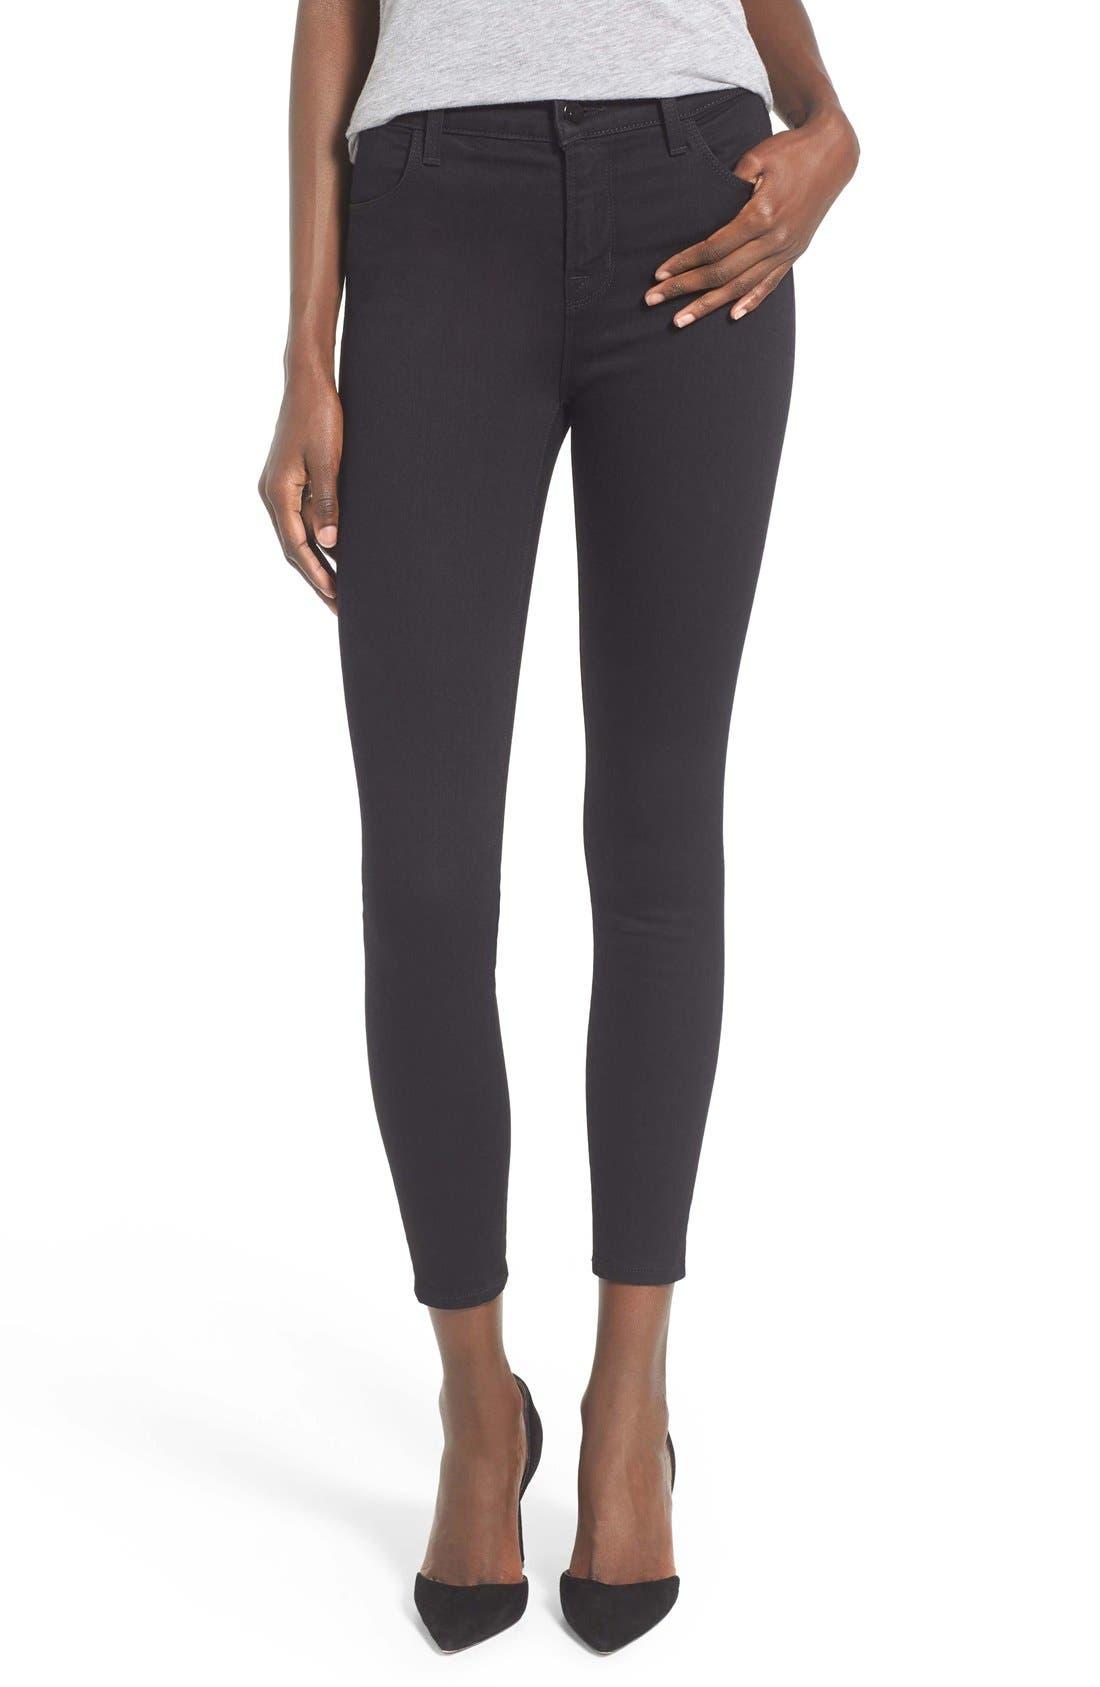 J brand girls' dark vintage skinny jeans